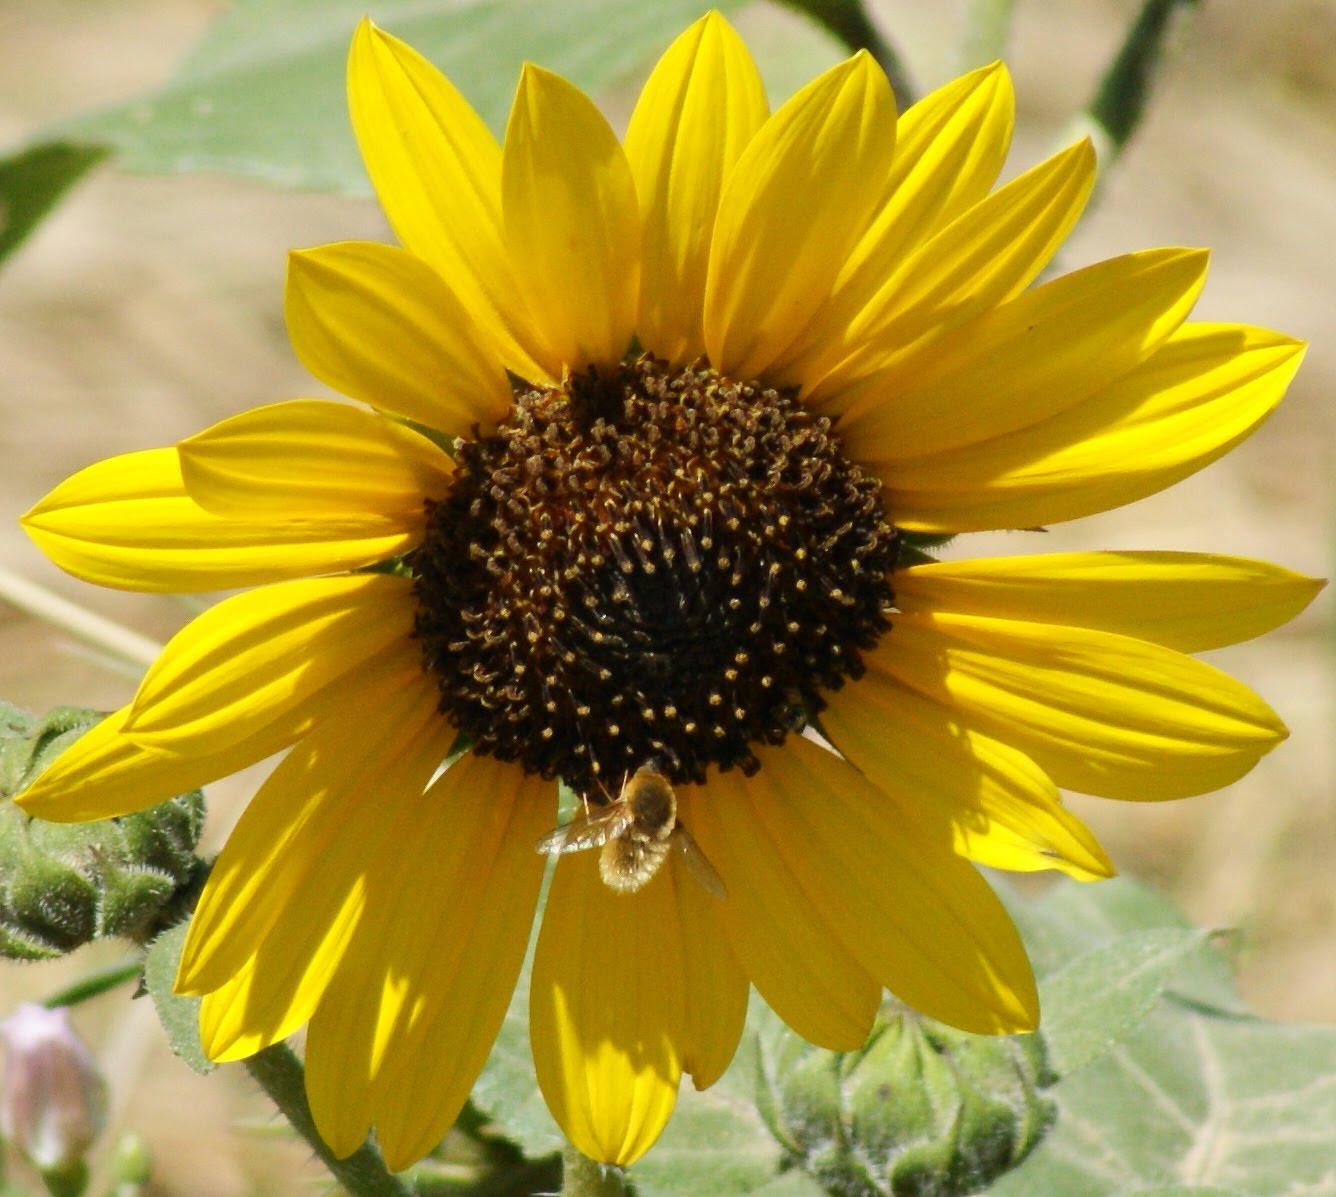 Anatomy Of A Sunflower Diagram